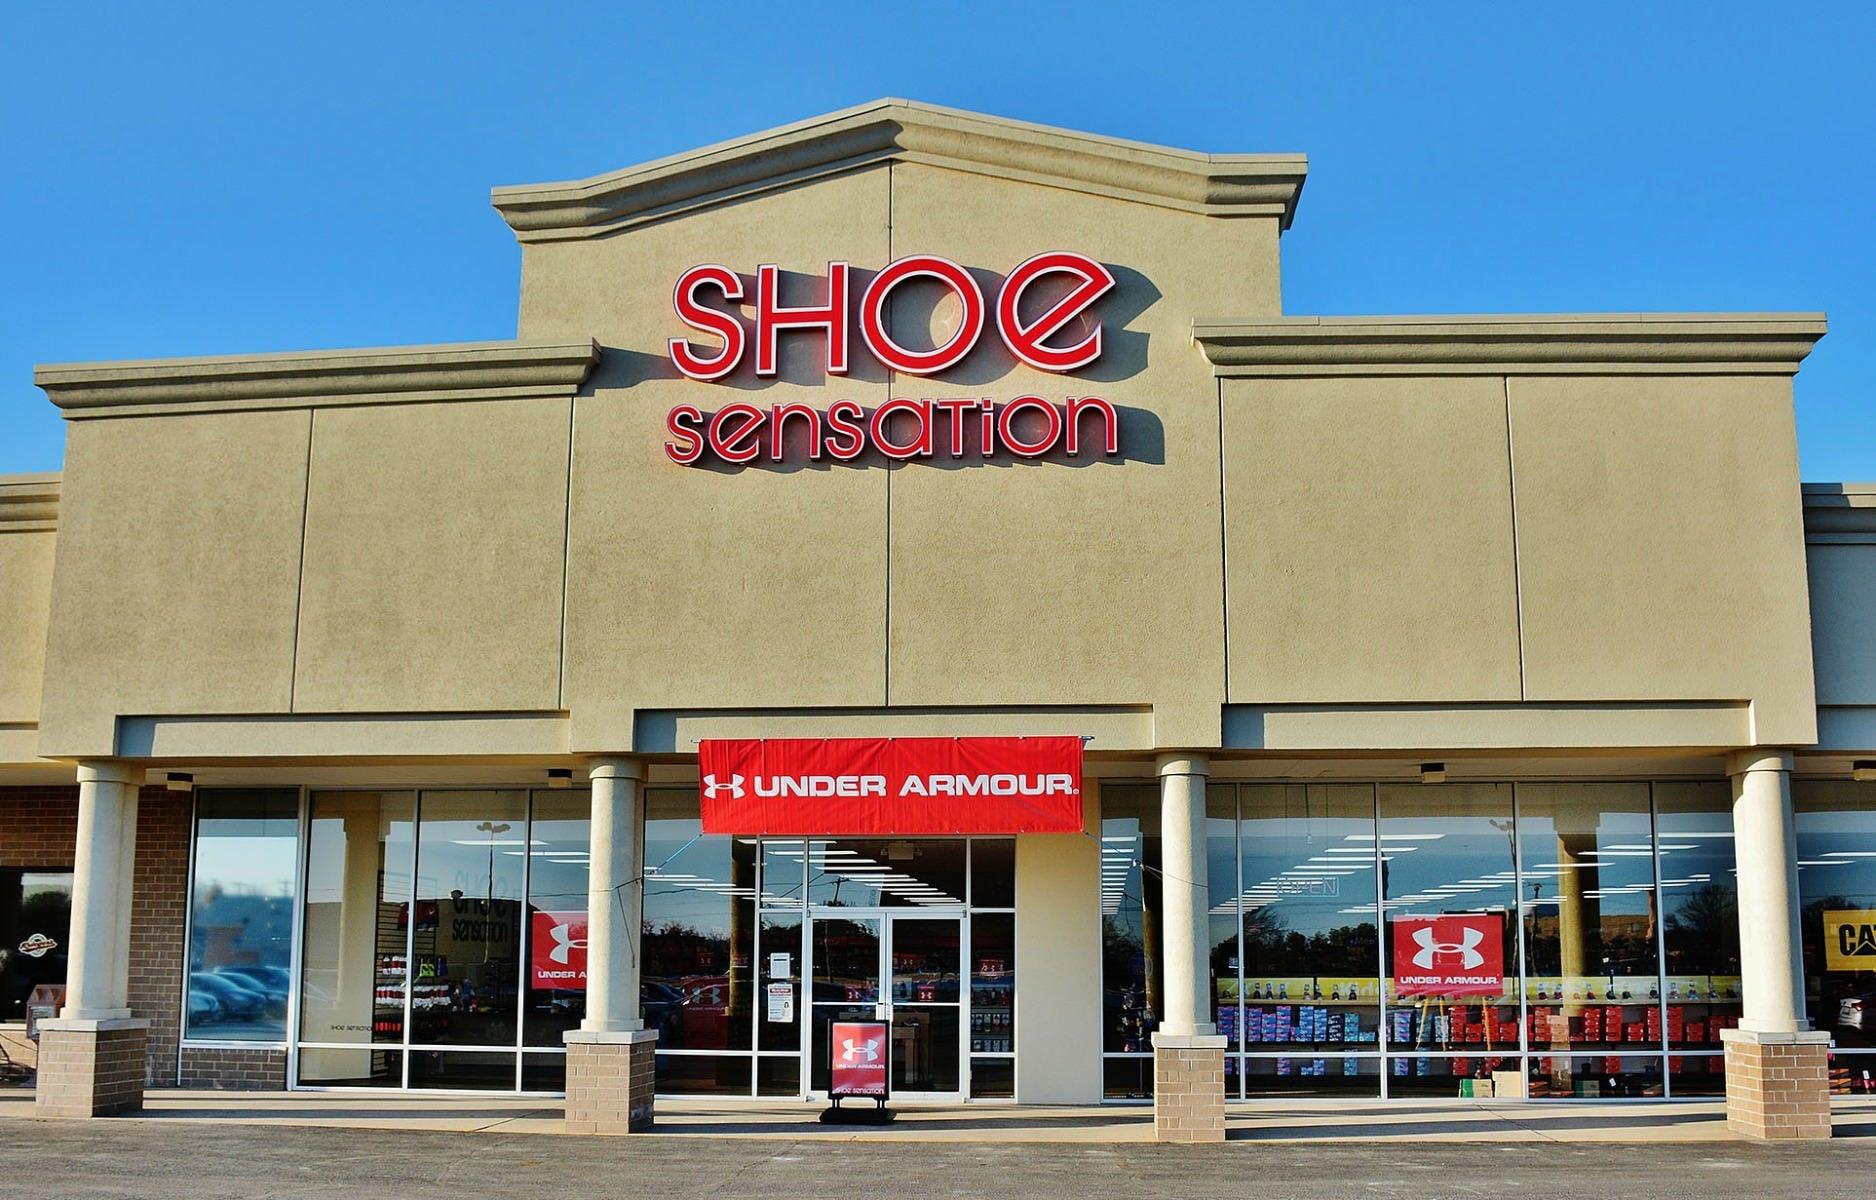 Shoe Sensation storefront with Under Armour sale displays.